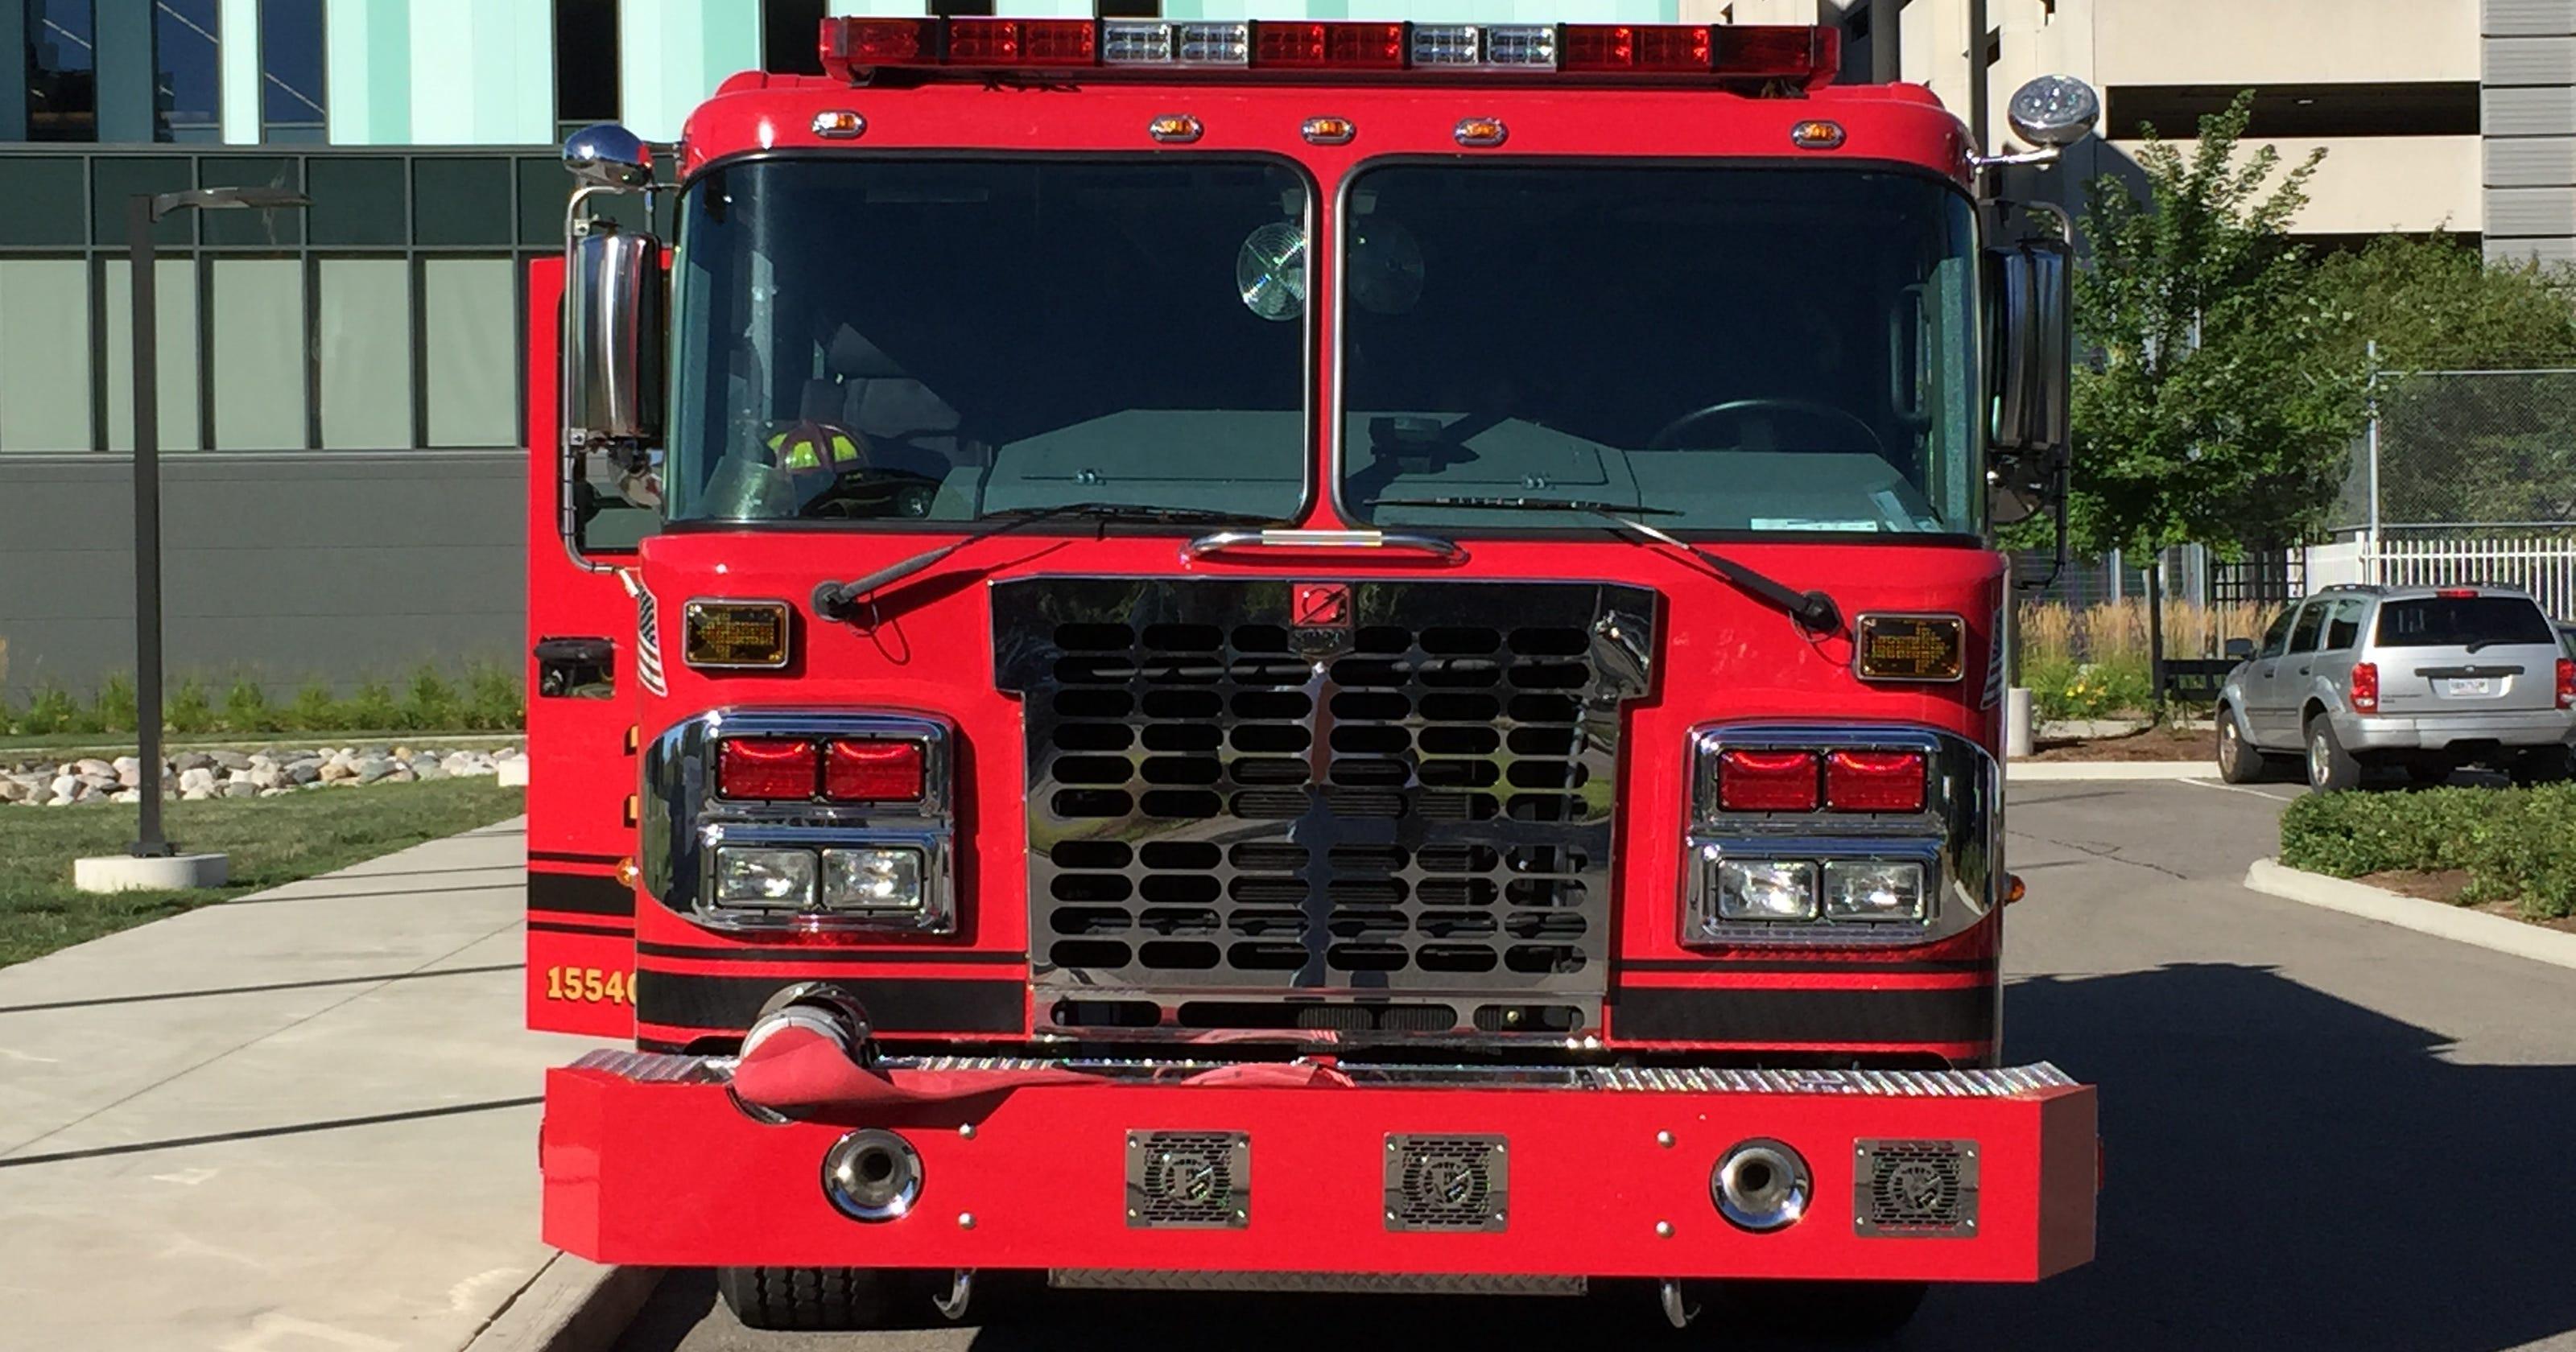 Detroit reveals 5 sparkling new fire engines